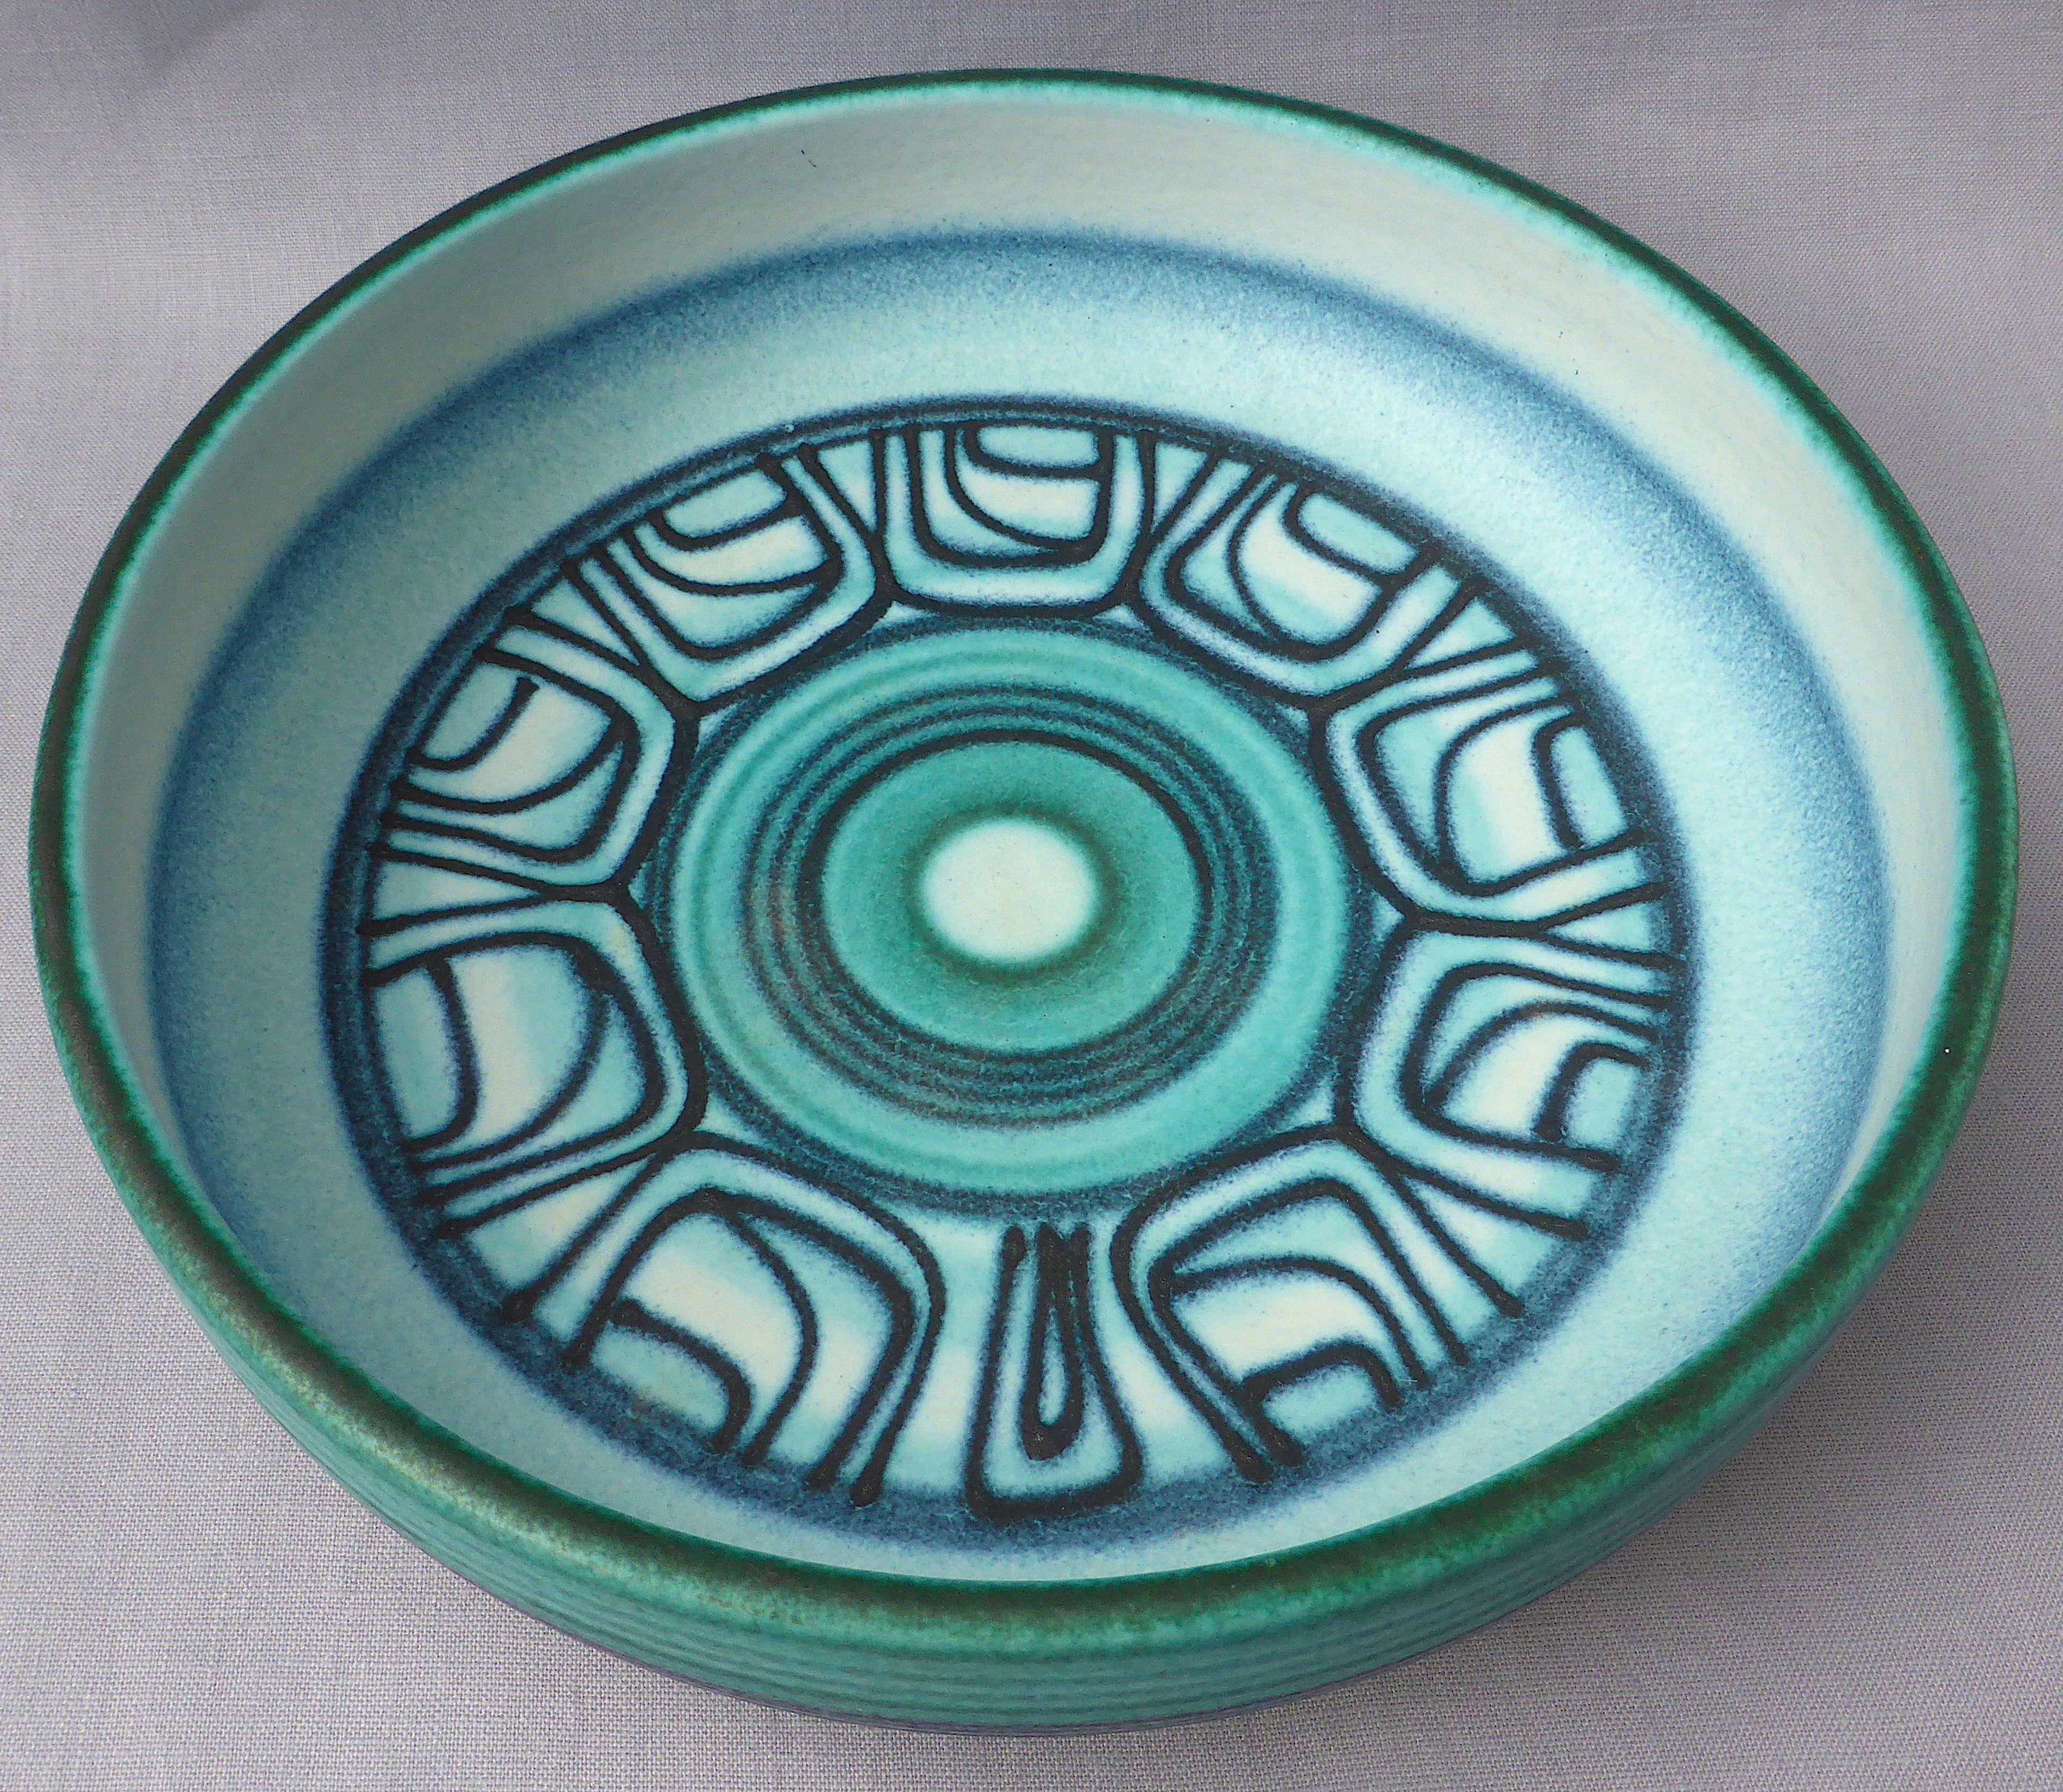 Spanish art pottery bowl by Jordi Serra Moragas